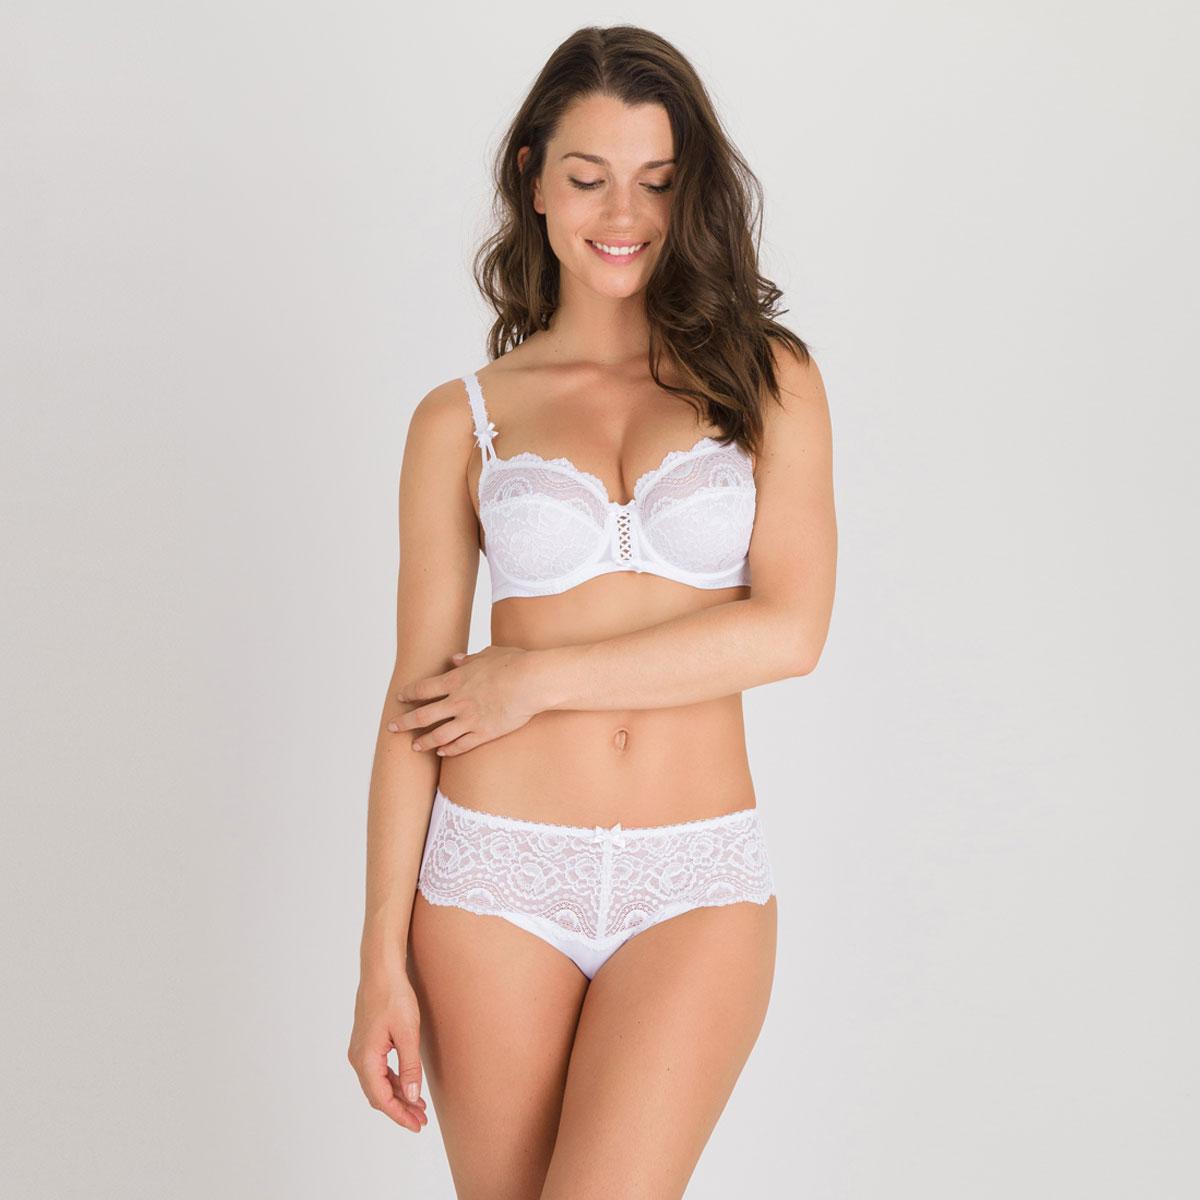 Soutien-gorge balconnet blanc - Flower Elegance-PLAYTEX